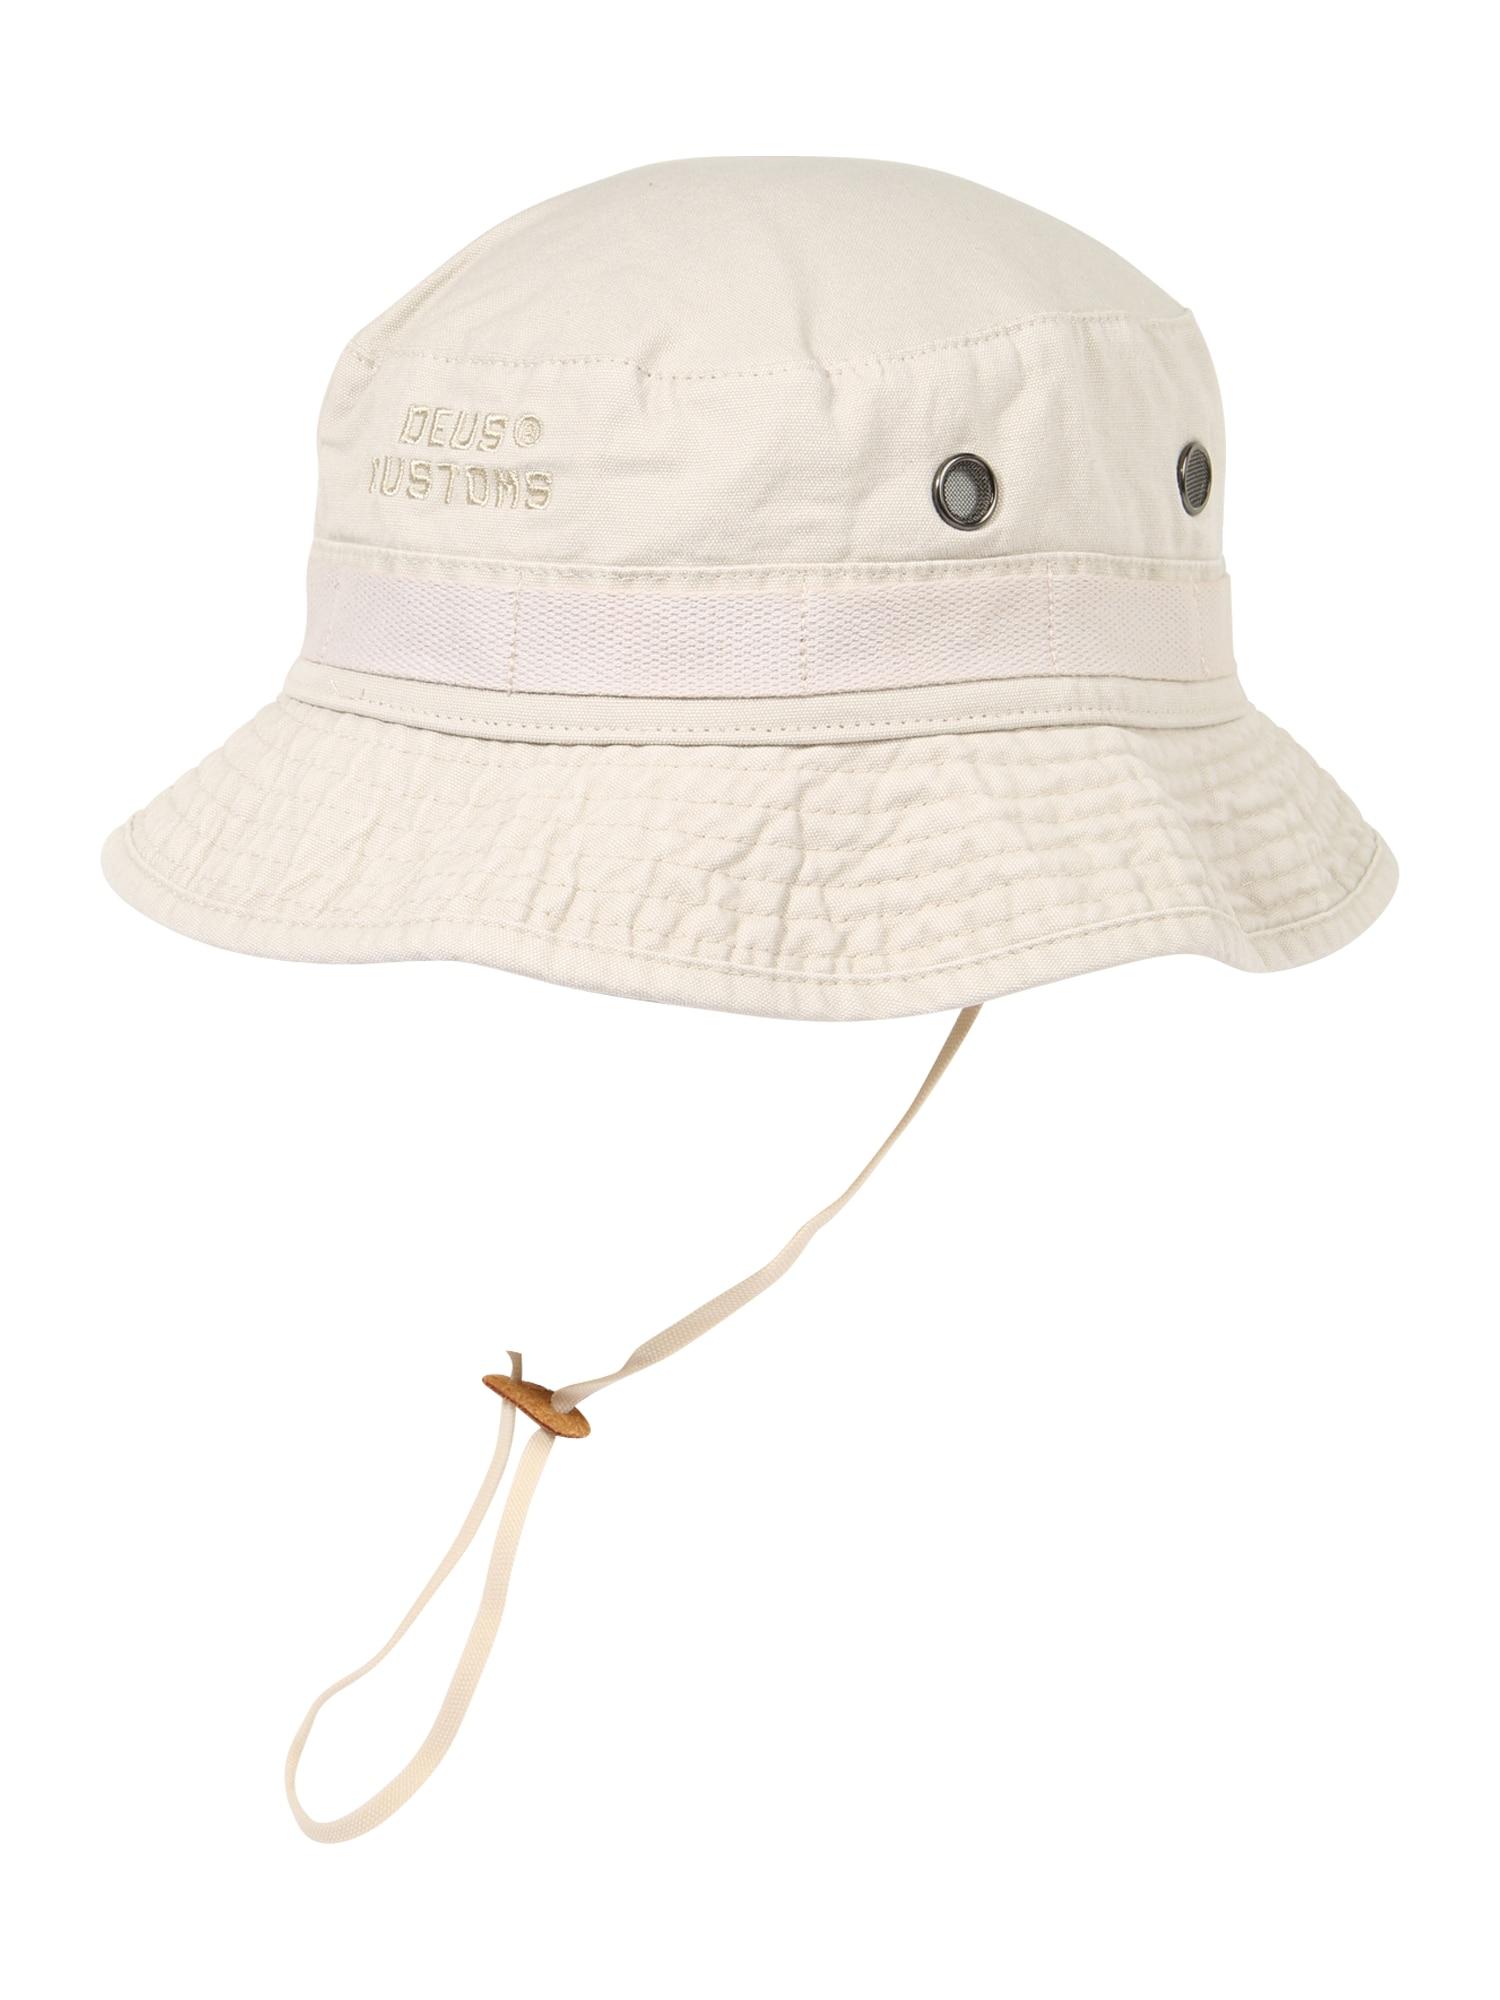 DEUS EX MACHINA Skrybėlaitė 'Fisher Bucket' gelsvai pilka spalva / balta